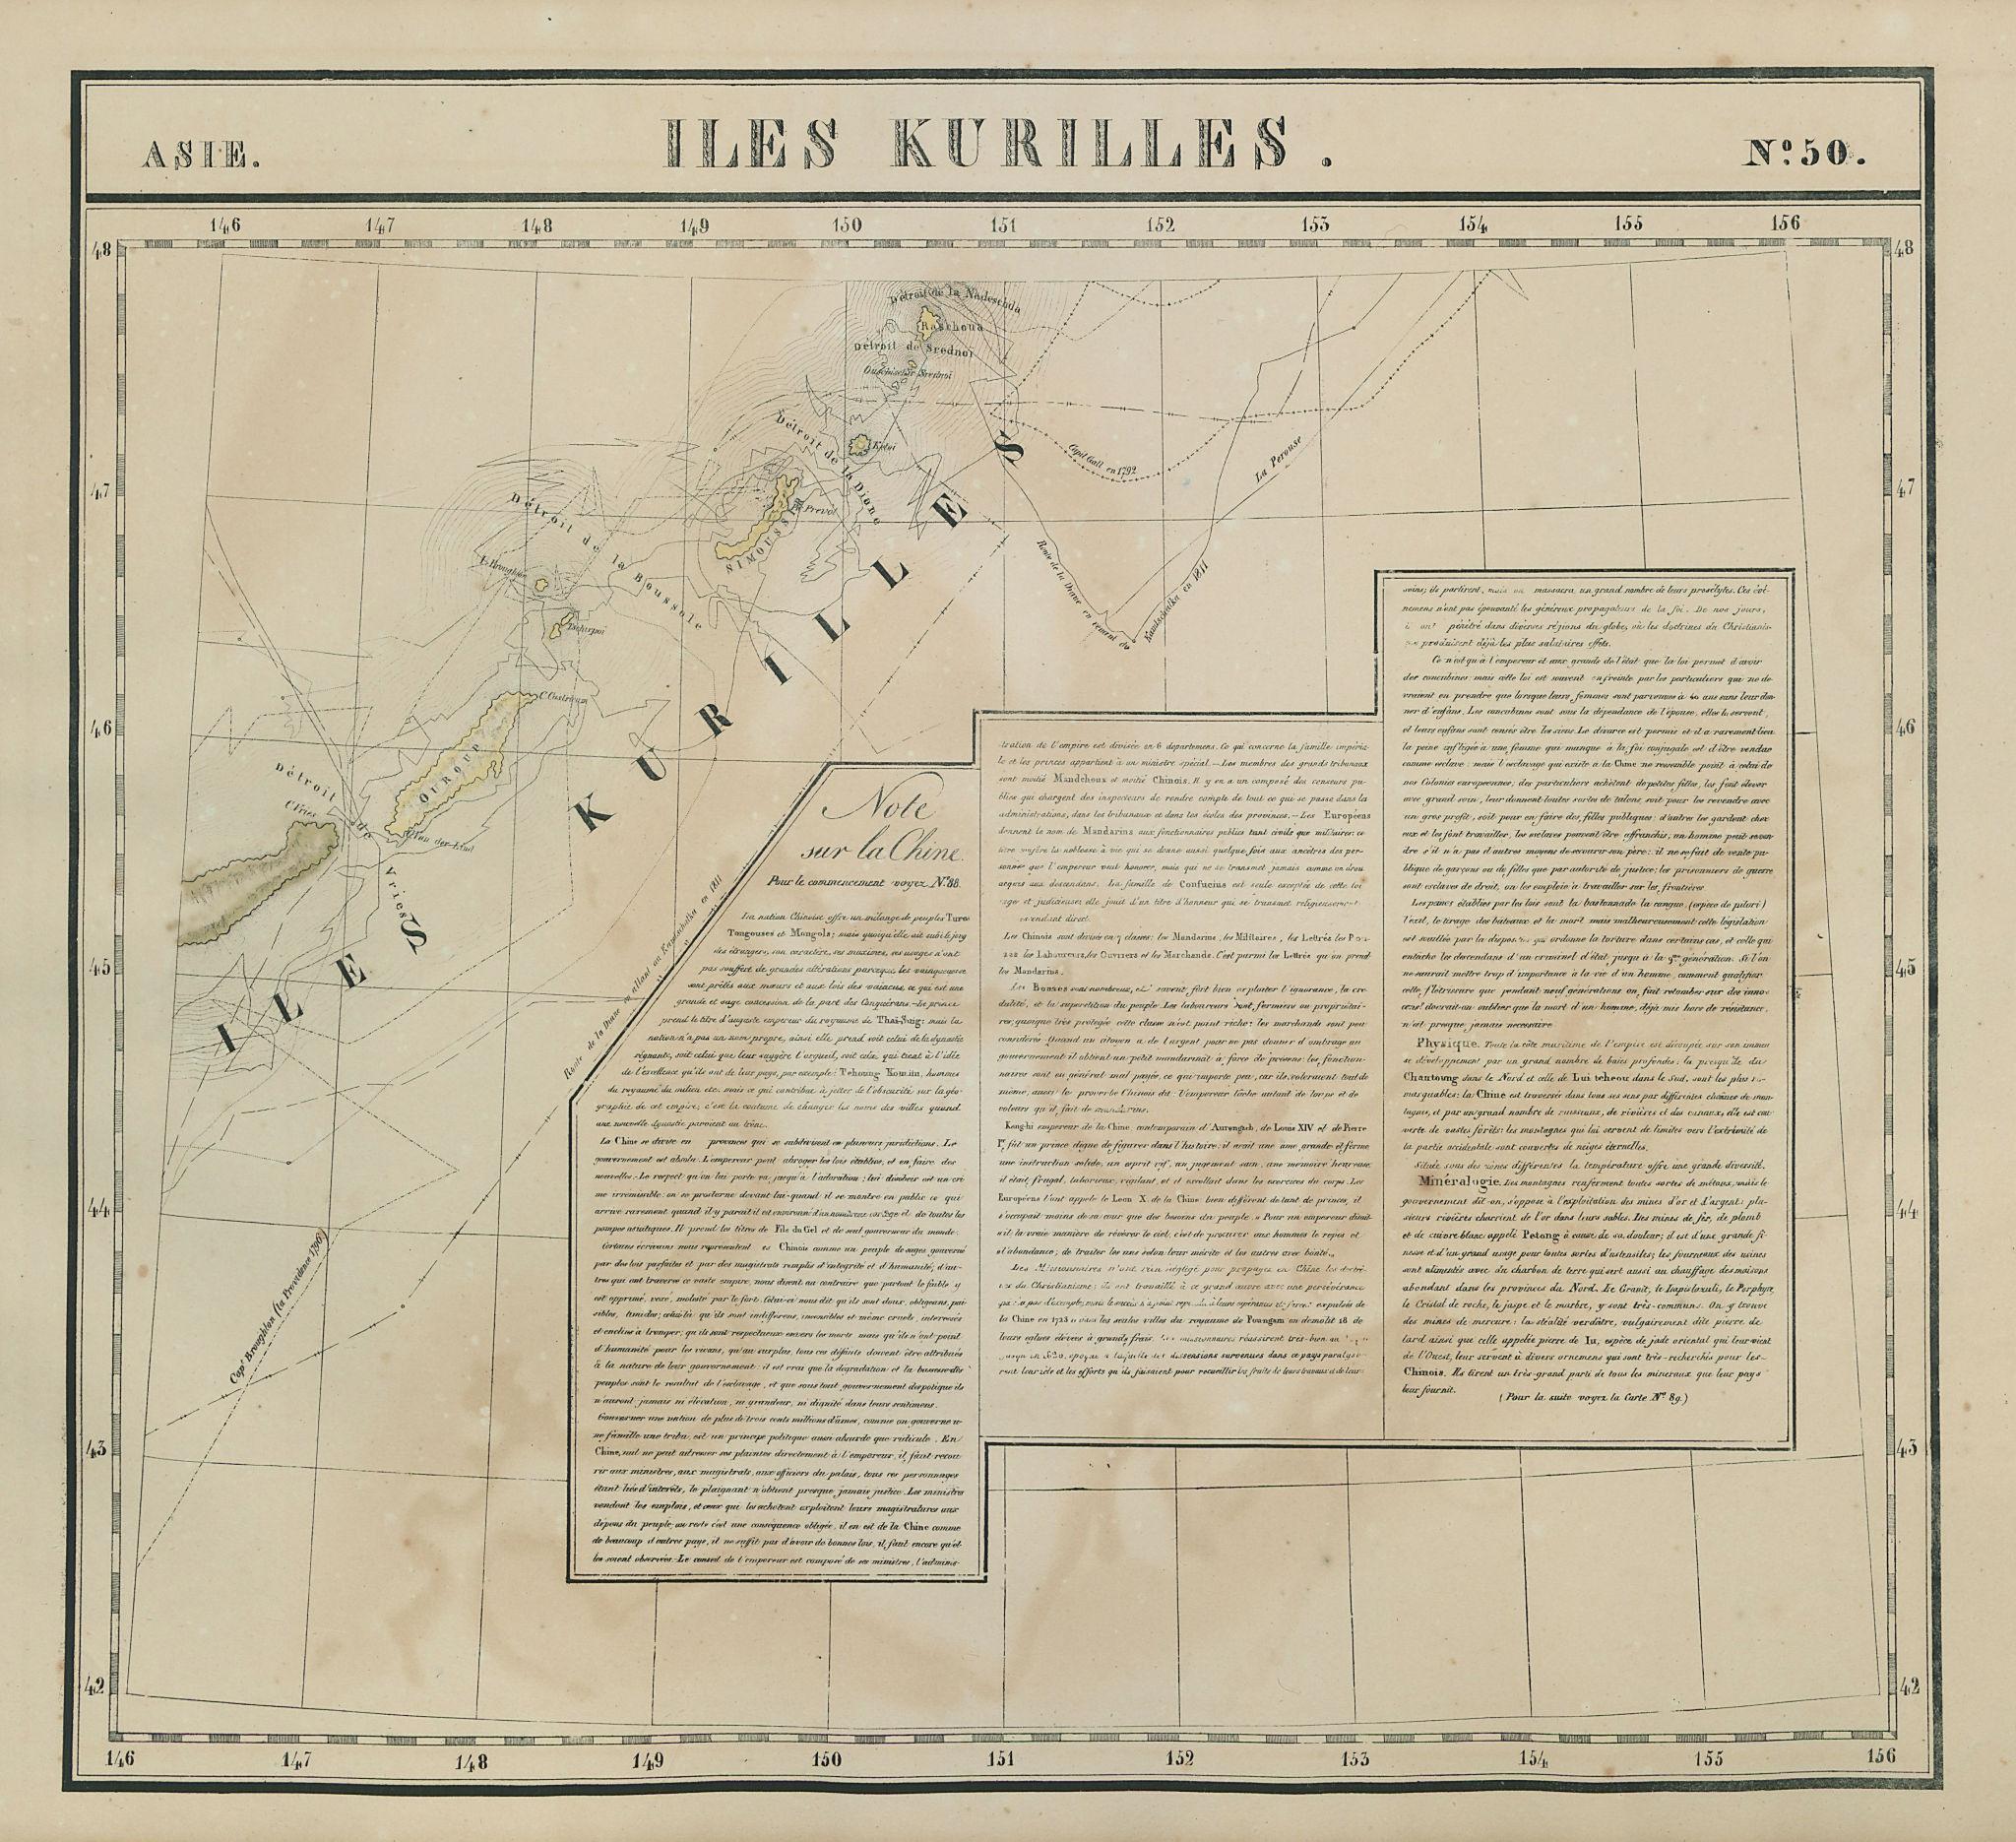 Asie. Iles Kurilles #50 Southern Kurile islands. Russia. VANDERMAELEN 1827 map